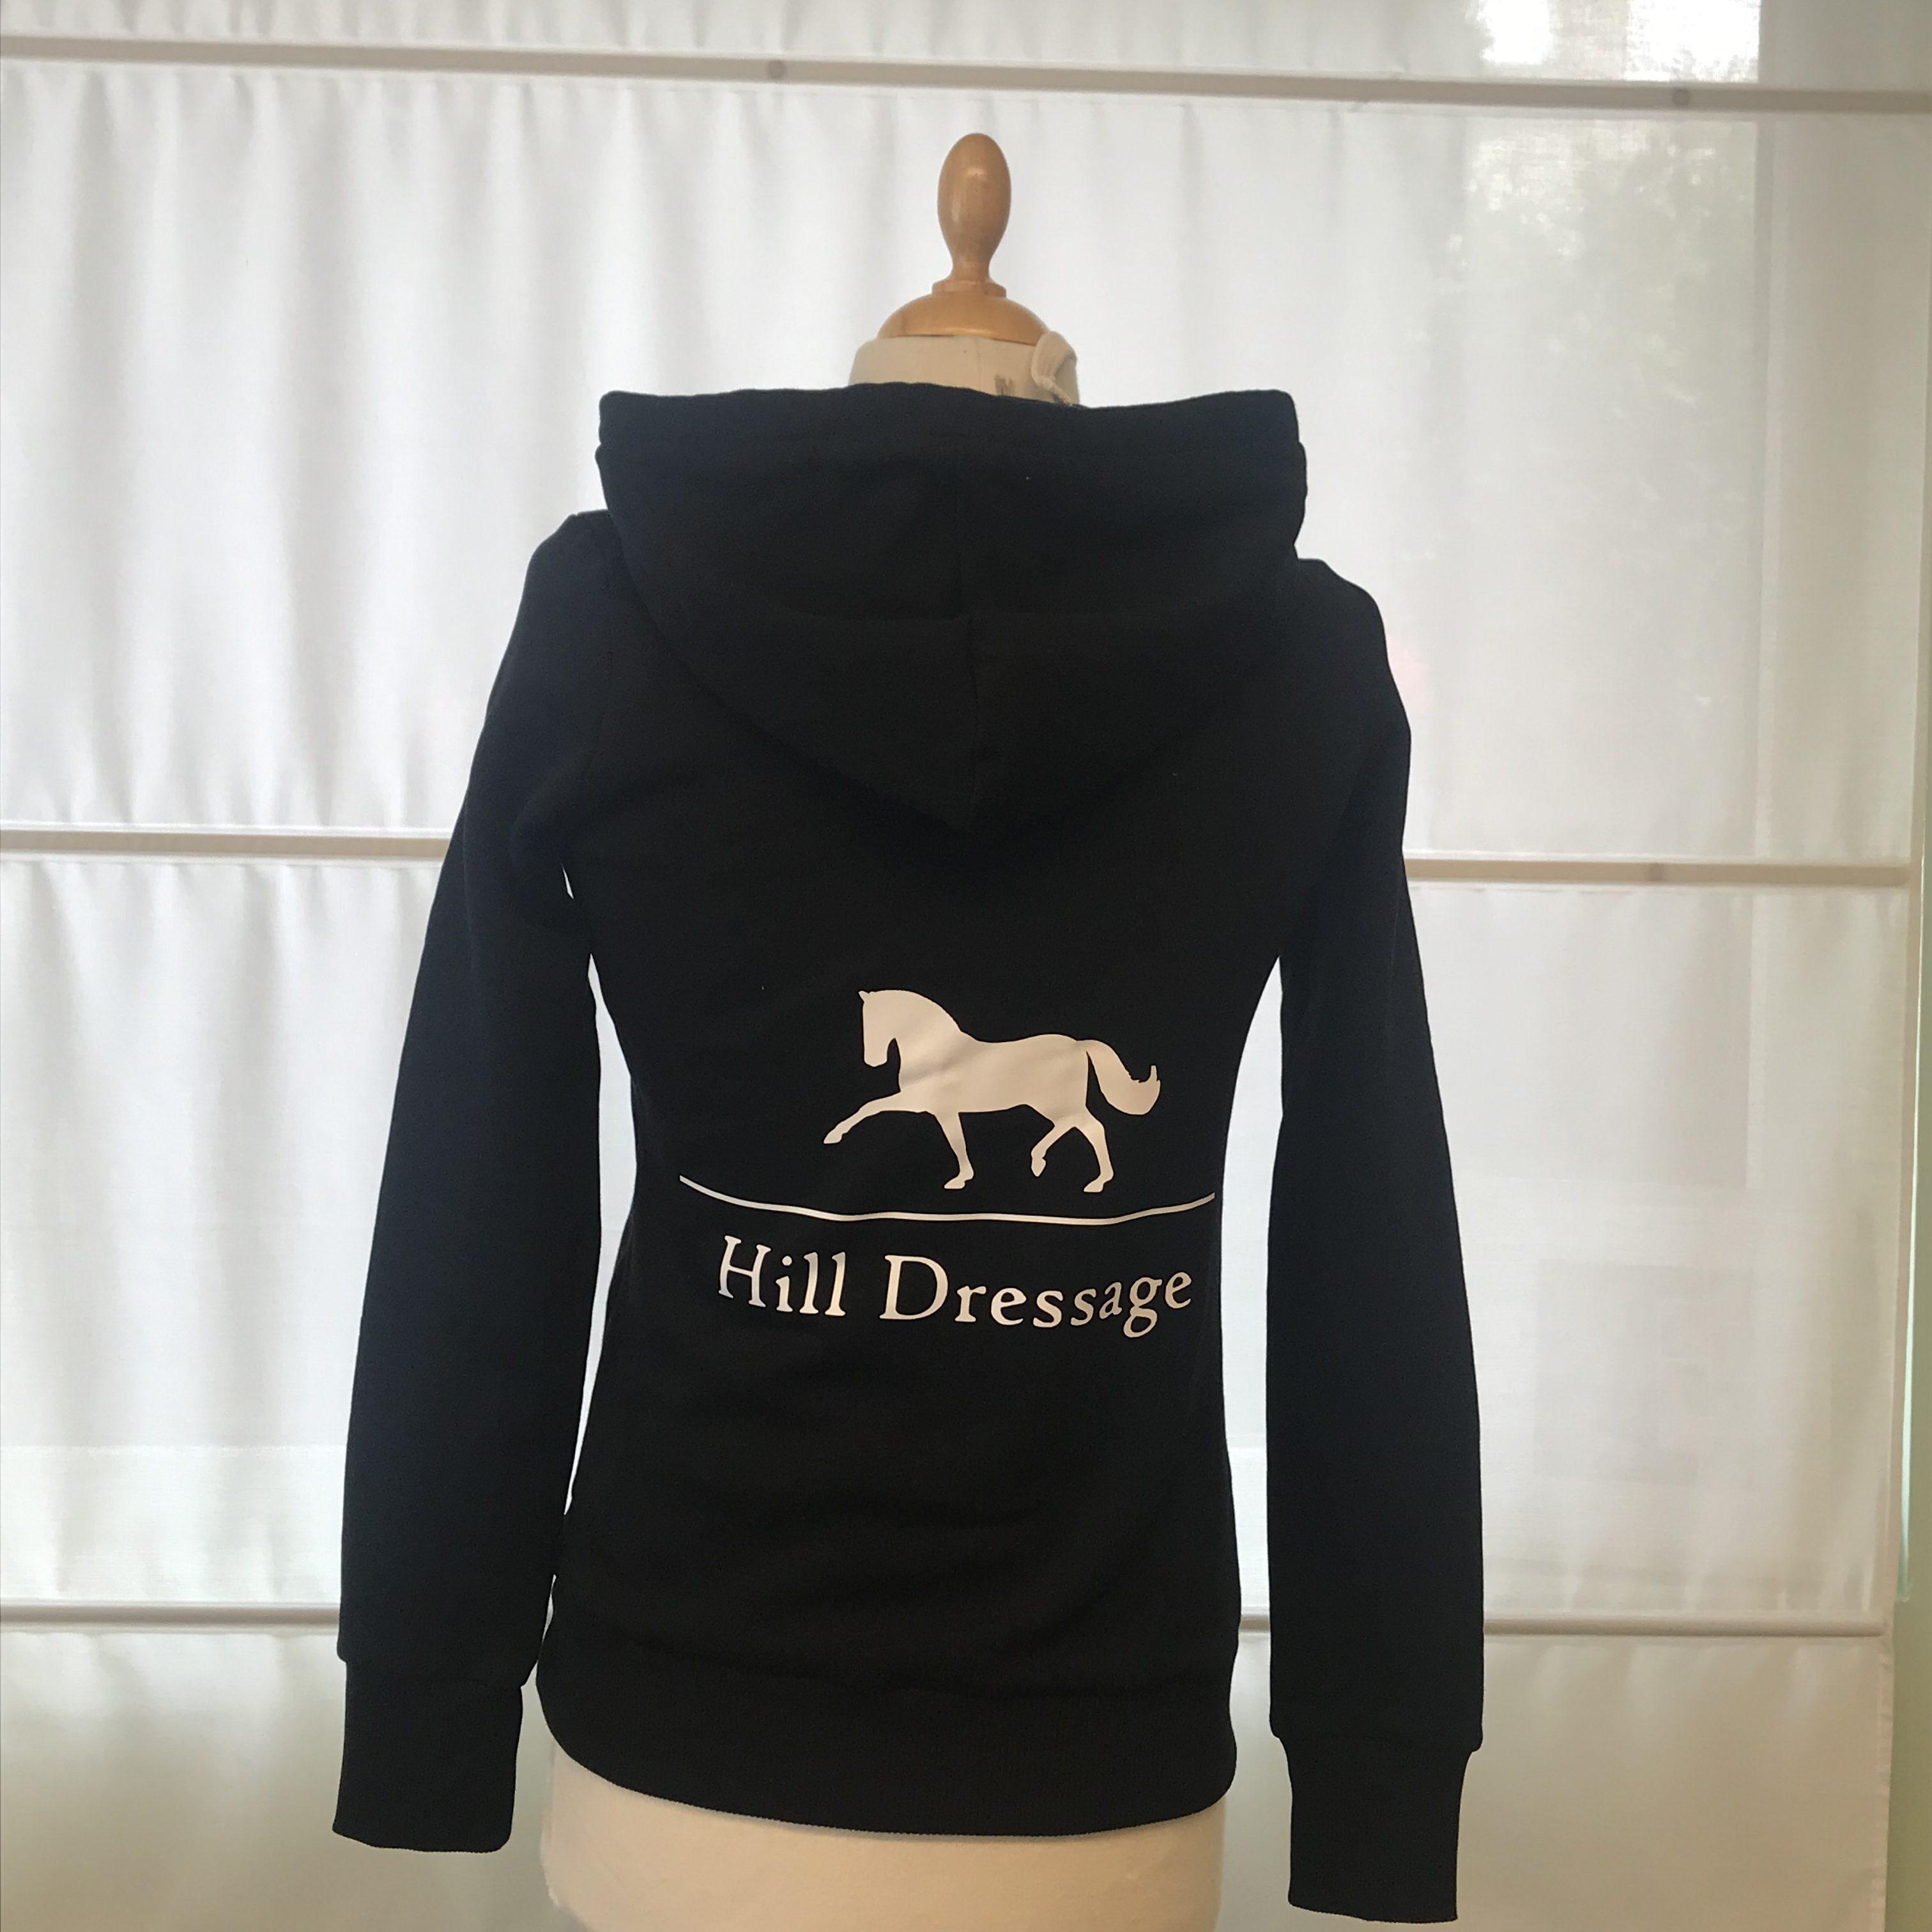 Hill Dressage sweater